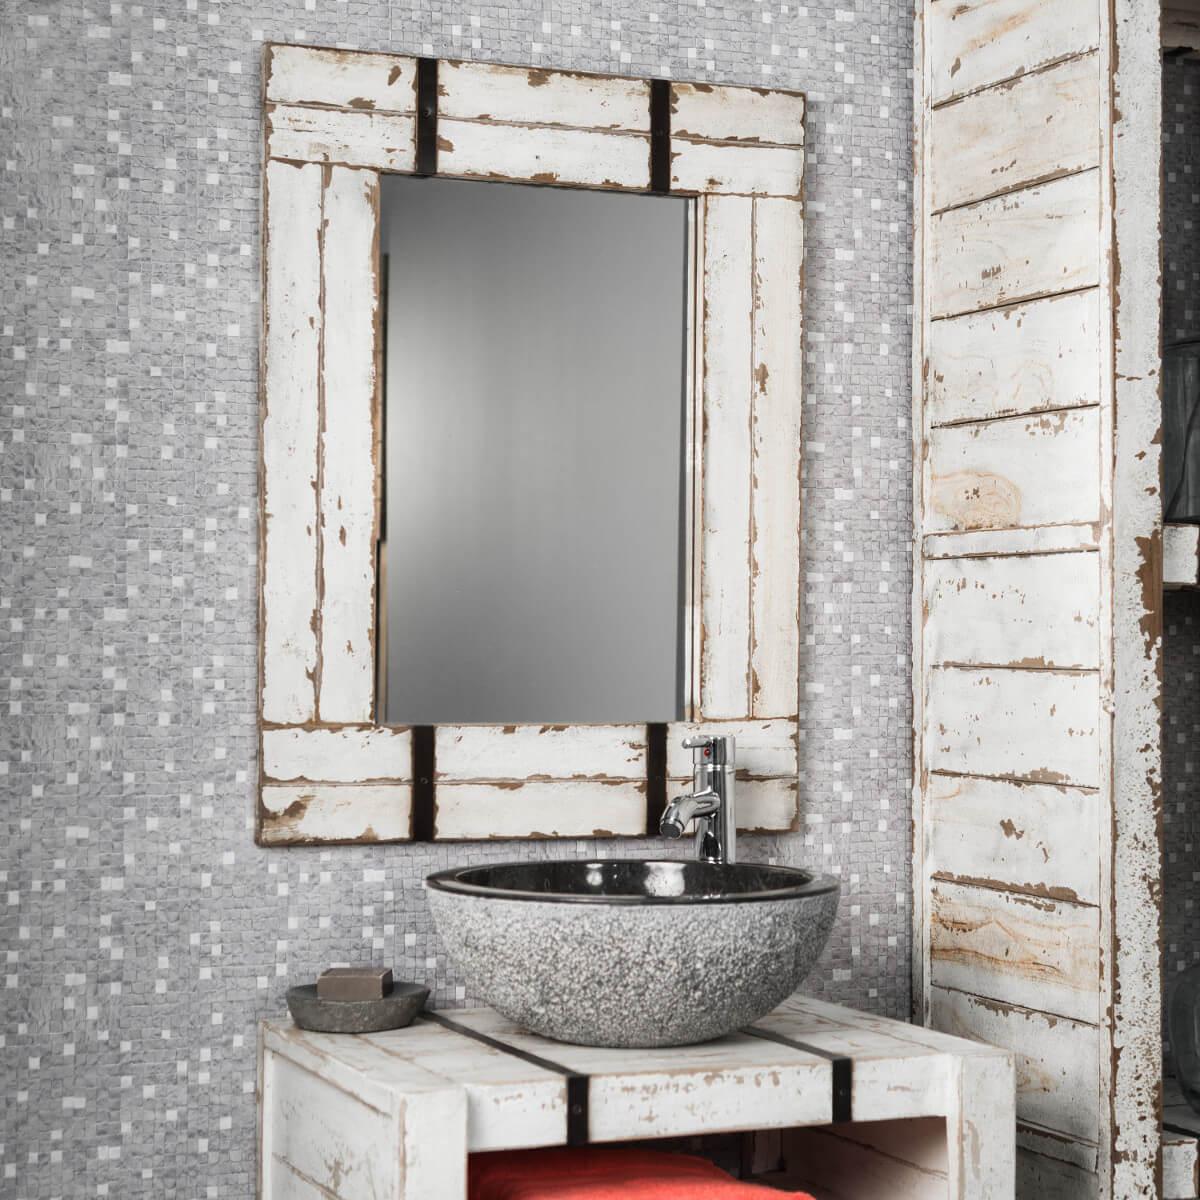 Miroir de salle de bain en mindi 60x80 loft - Miroir salle de bain en bois ...